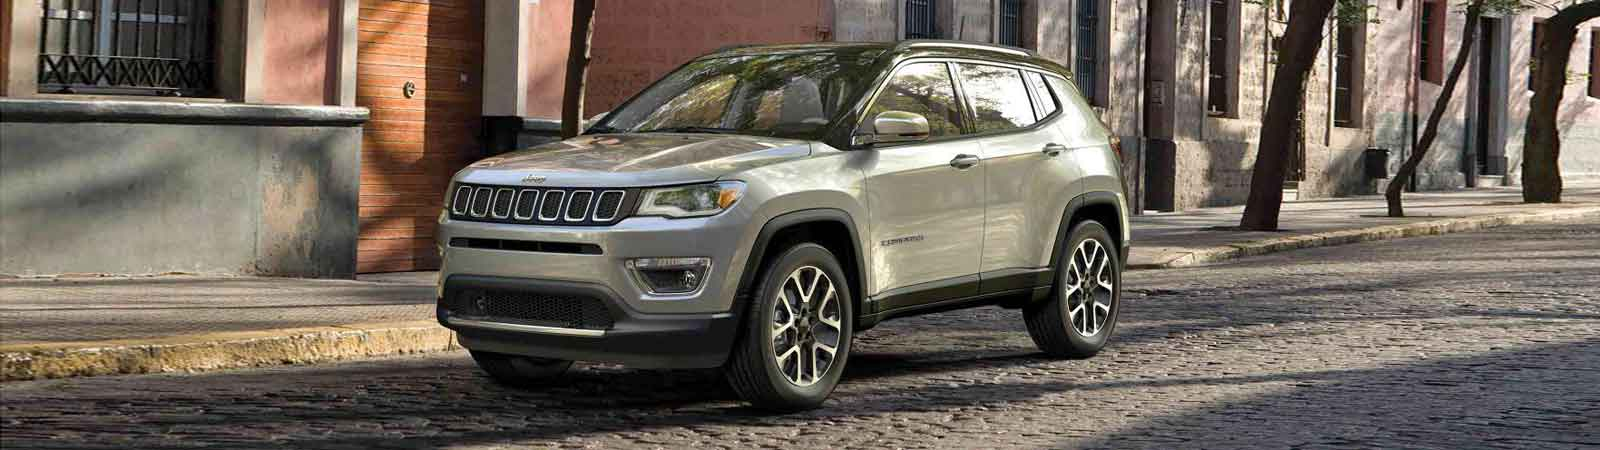 Jeep Dealership Columbus Ohio >> 2019 Jeep Compass Near Columbus Ohio Bob Boyd Chrysler